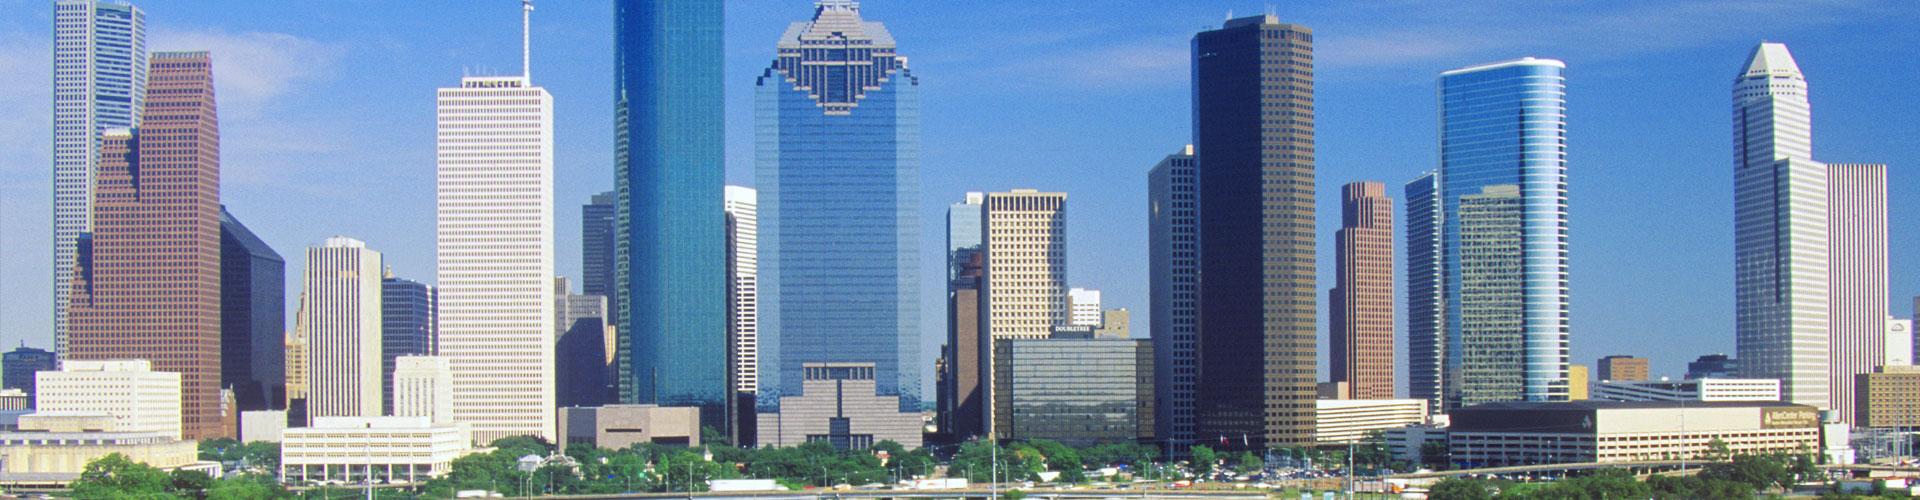 Microsoft Technology Centers - Houston